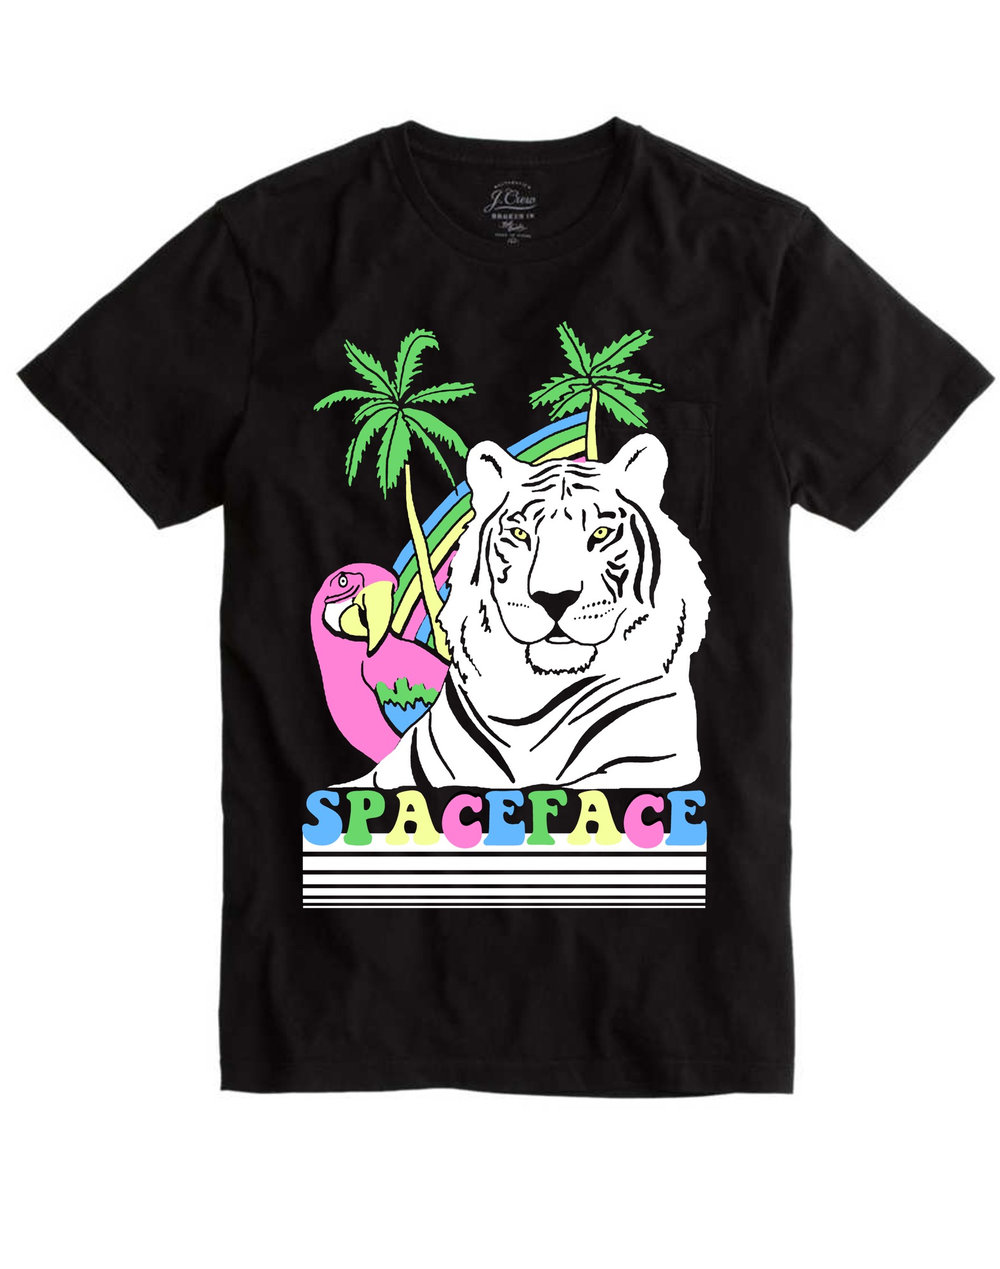 Shirt design examples - Spaceface T Shirt Design